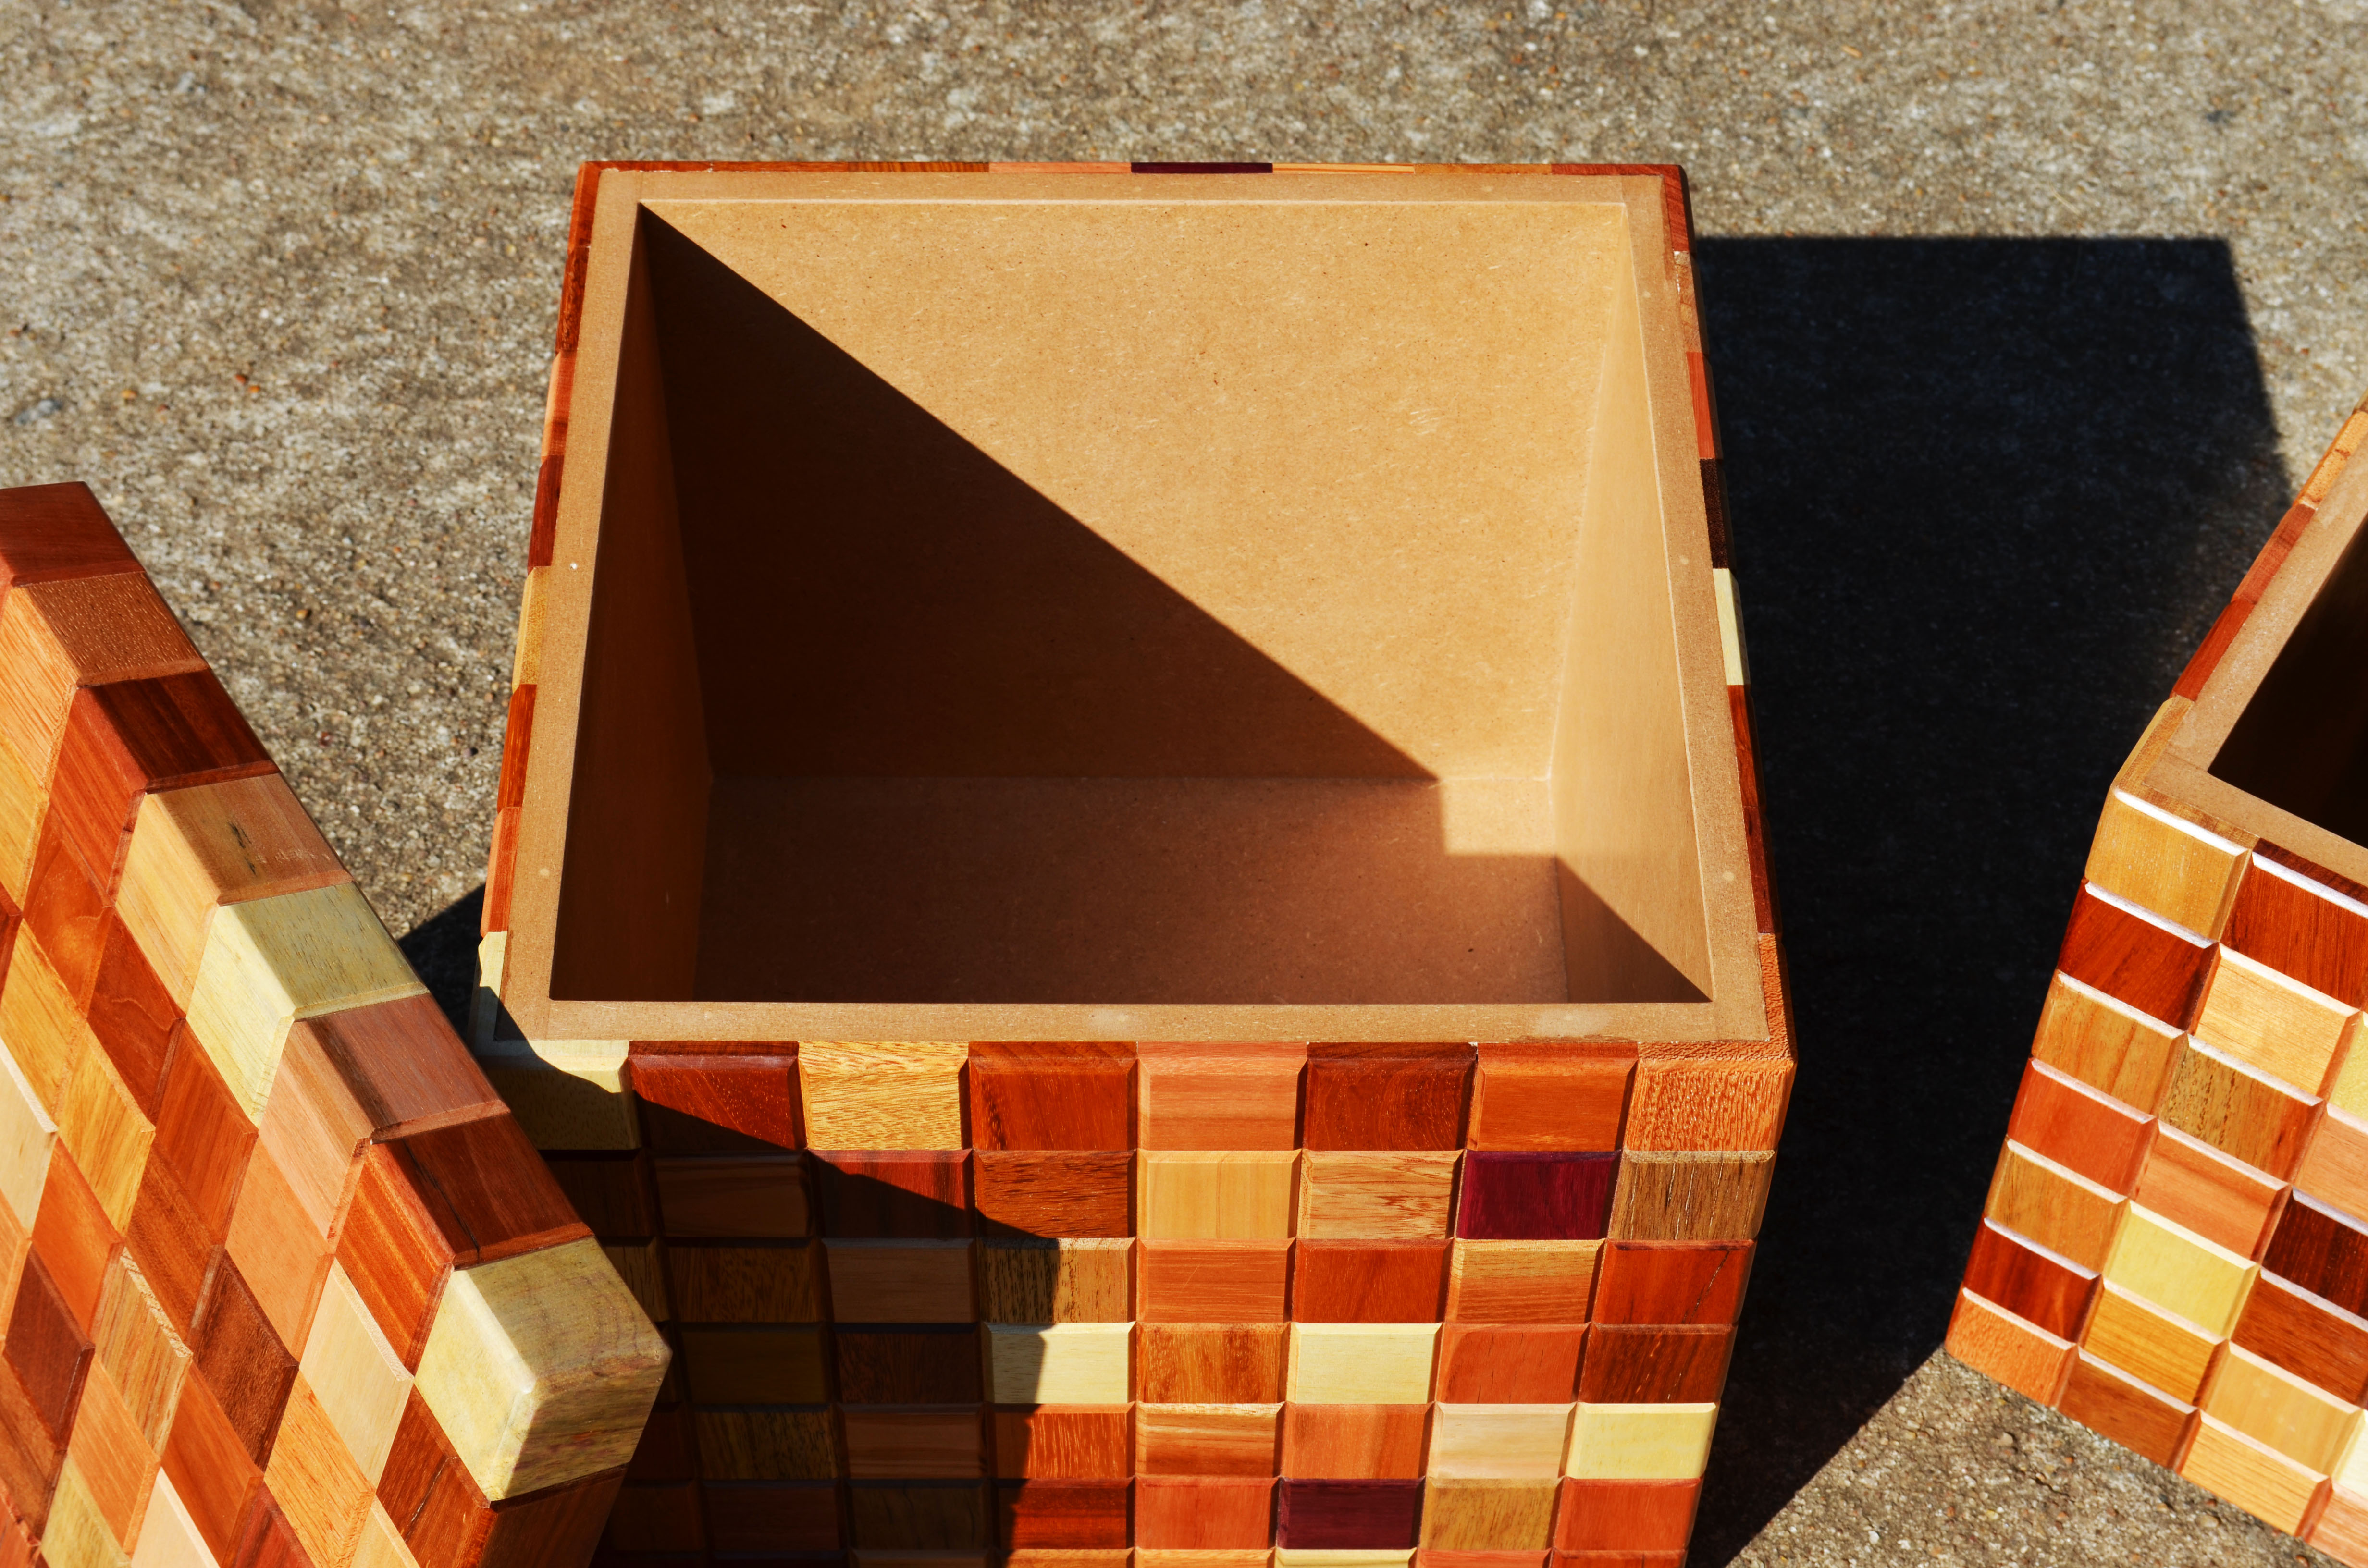 banco cubo baú RIPA Design #C03D0B 4928x3264